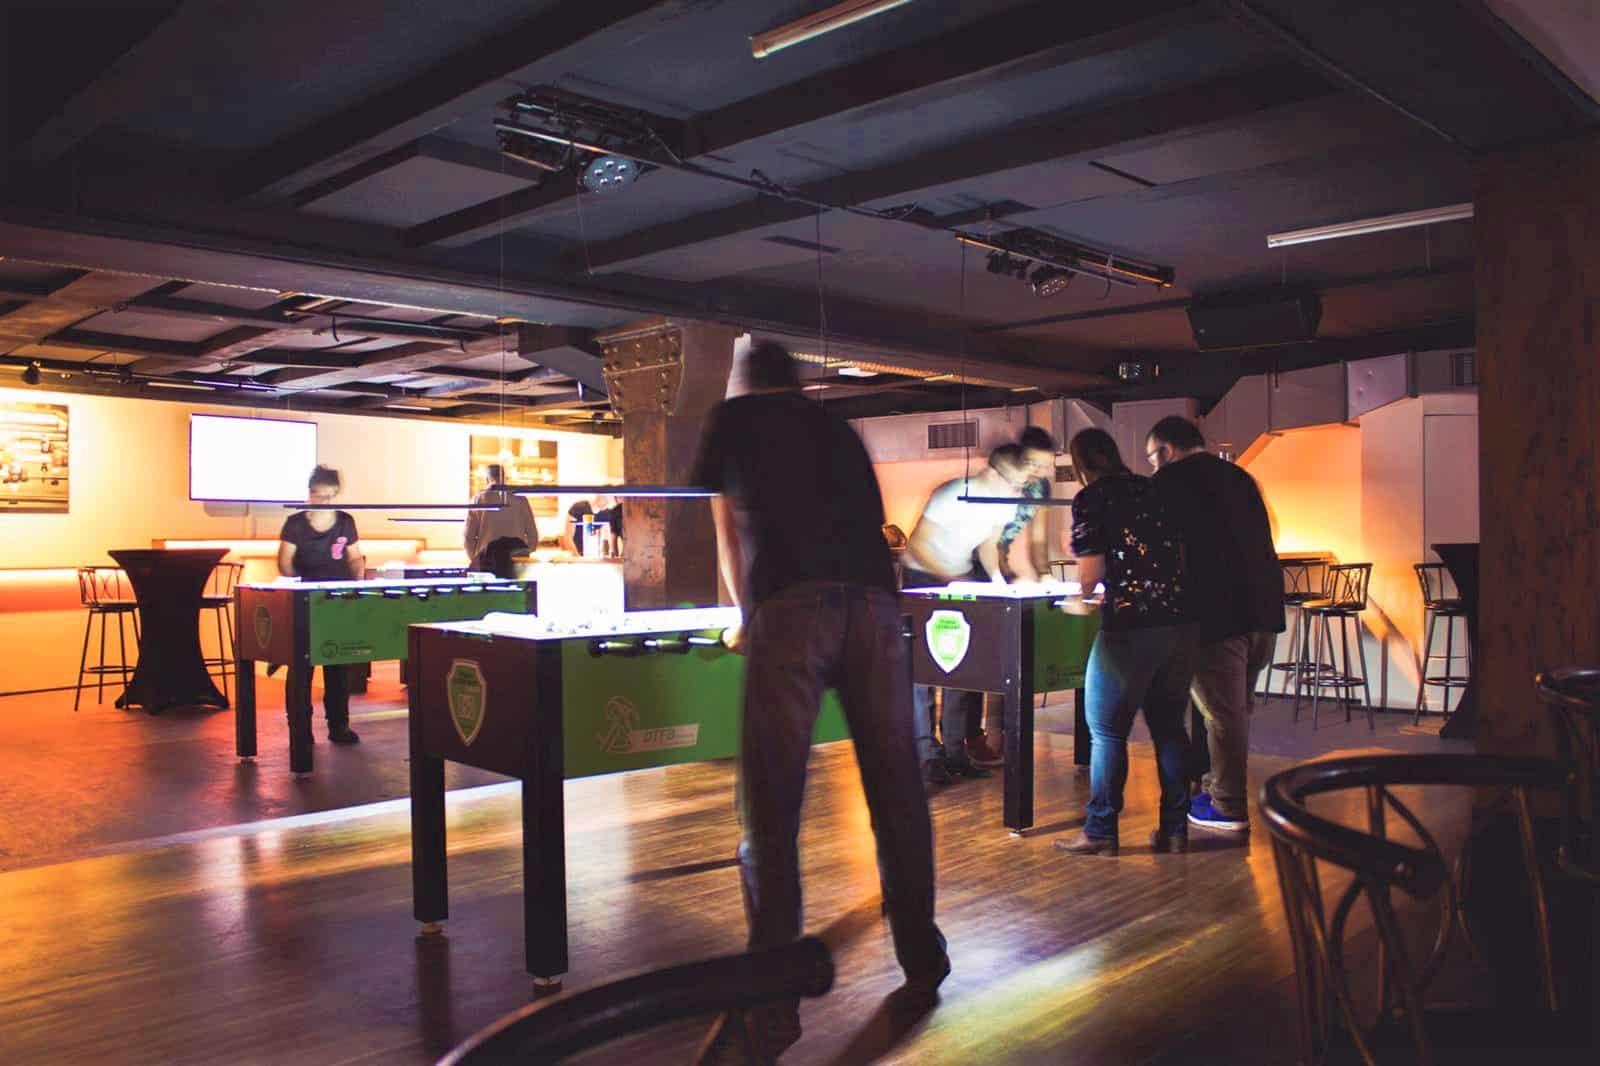 style hannover krökelbar B - KrökelBar – Tischfußball mitten in der City